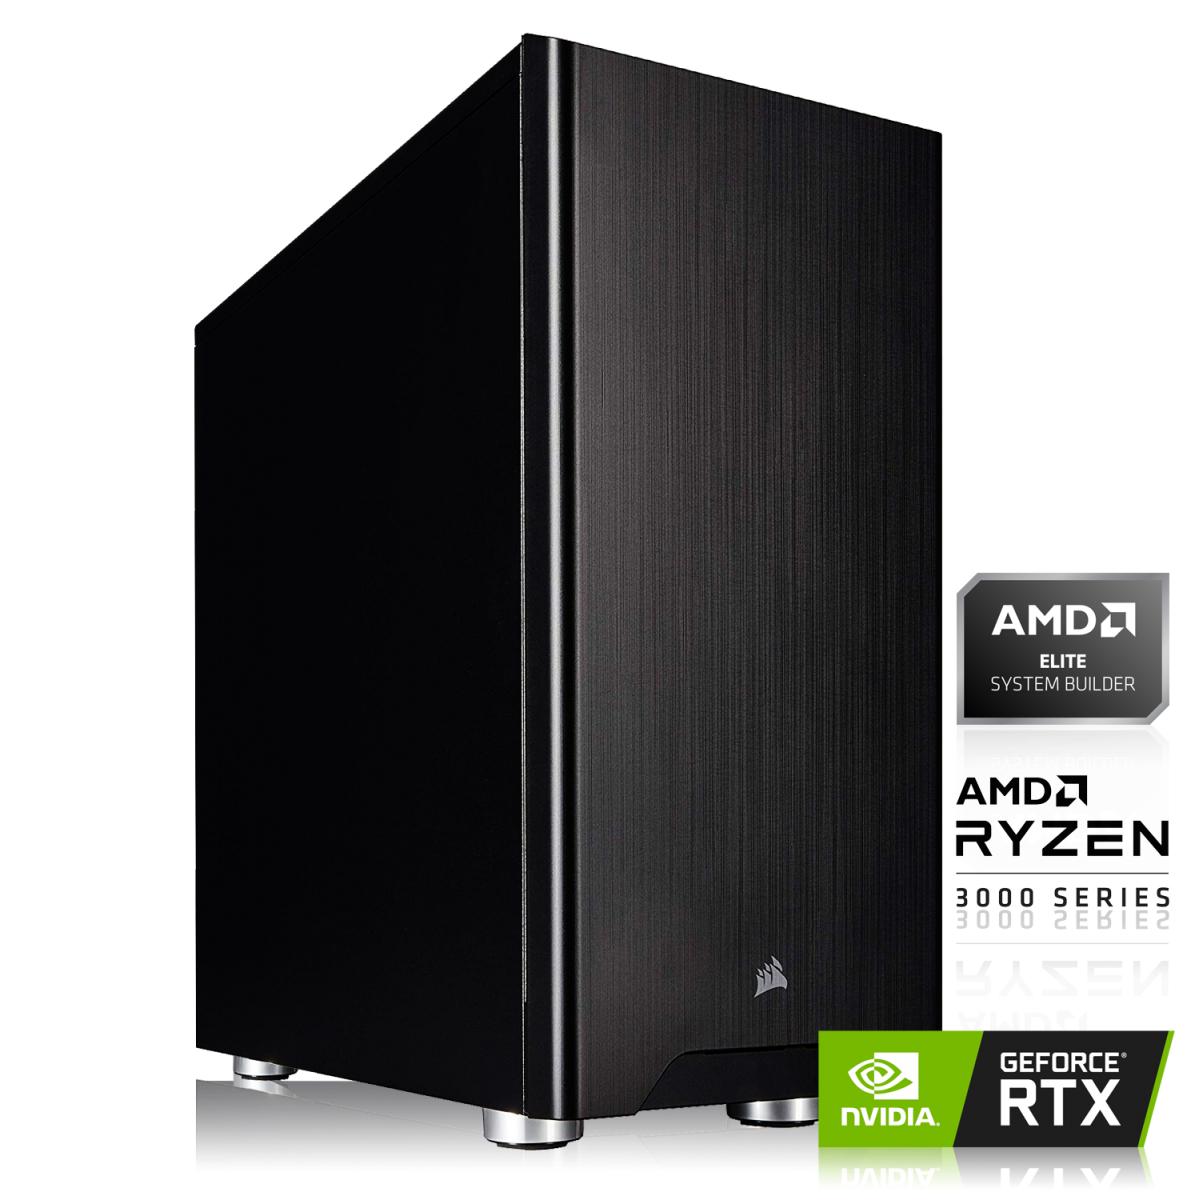 PC AMD Ryzen 7 3700X, 16Go RAM 3000mHz, RTX 2080 SUPER, SSD 240 Go + HDD 1To, Alim Corsair 650W